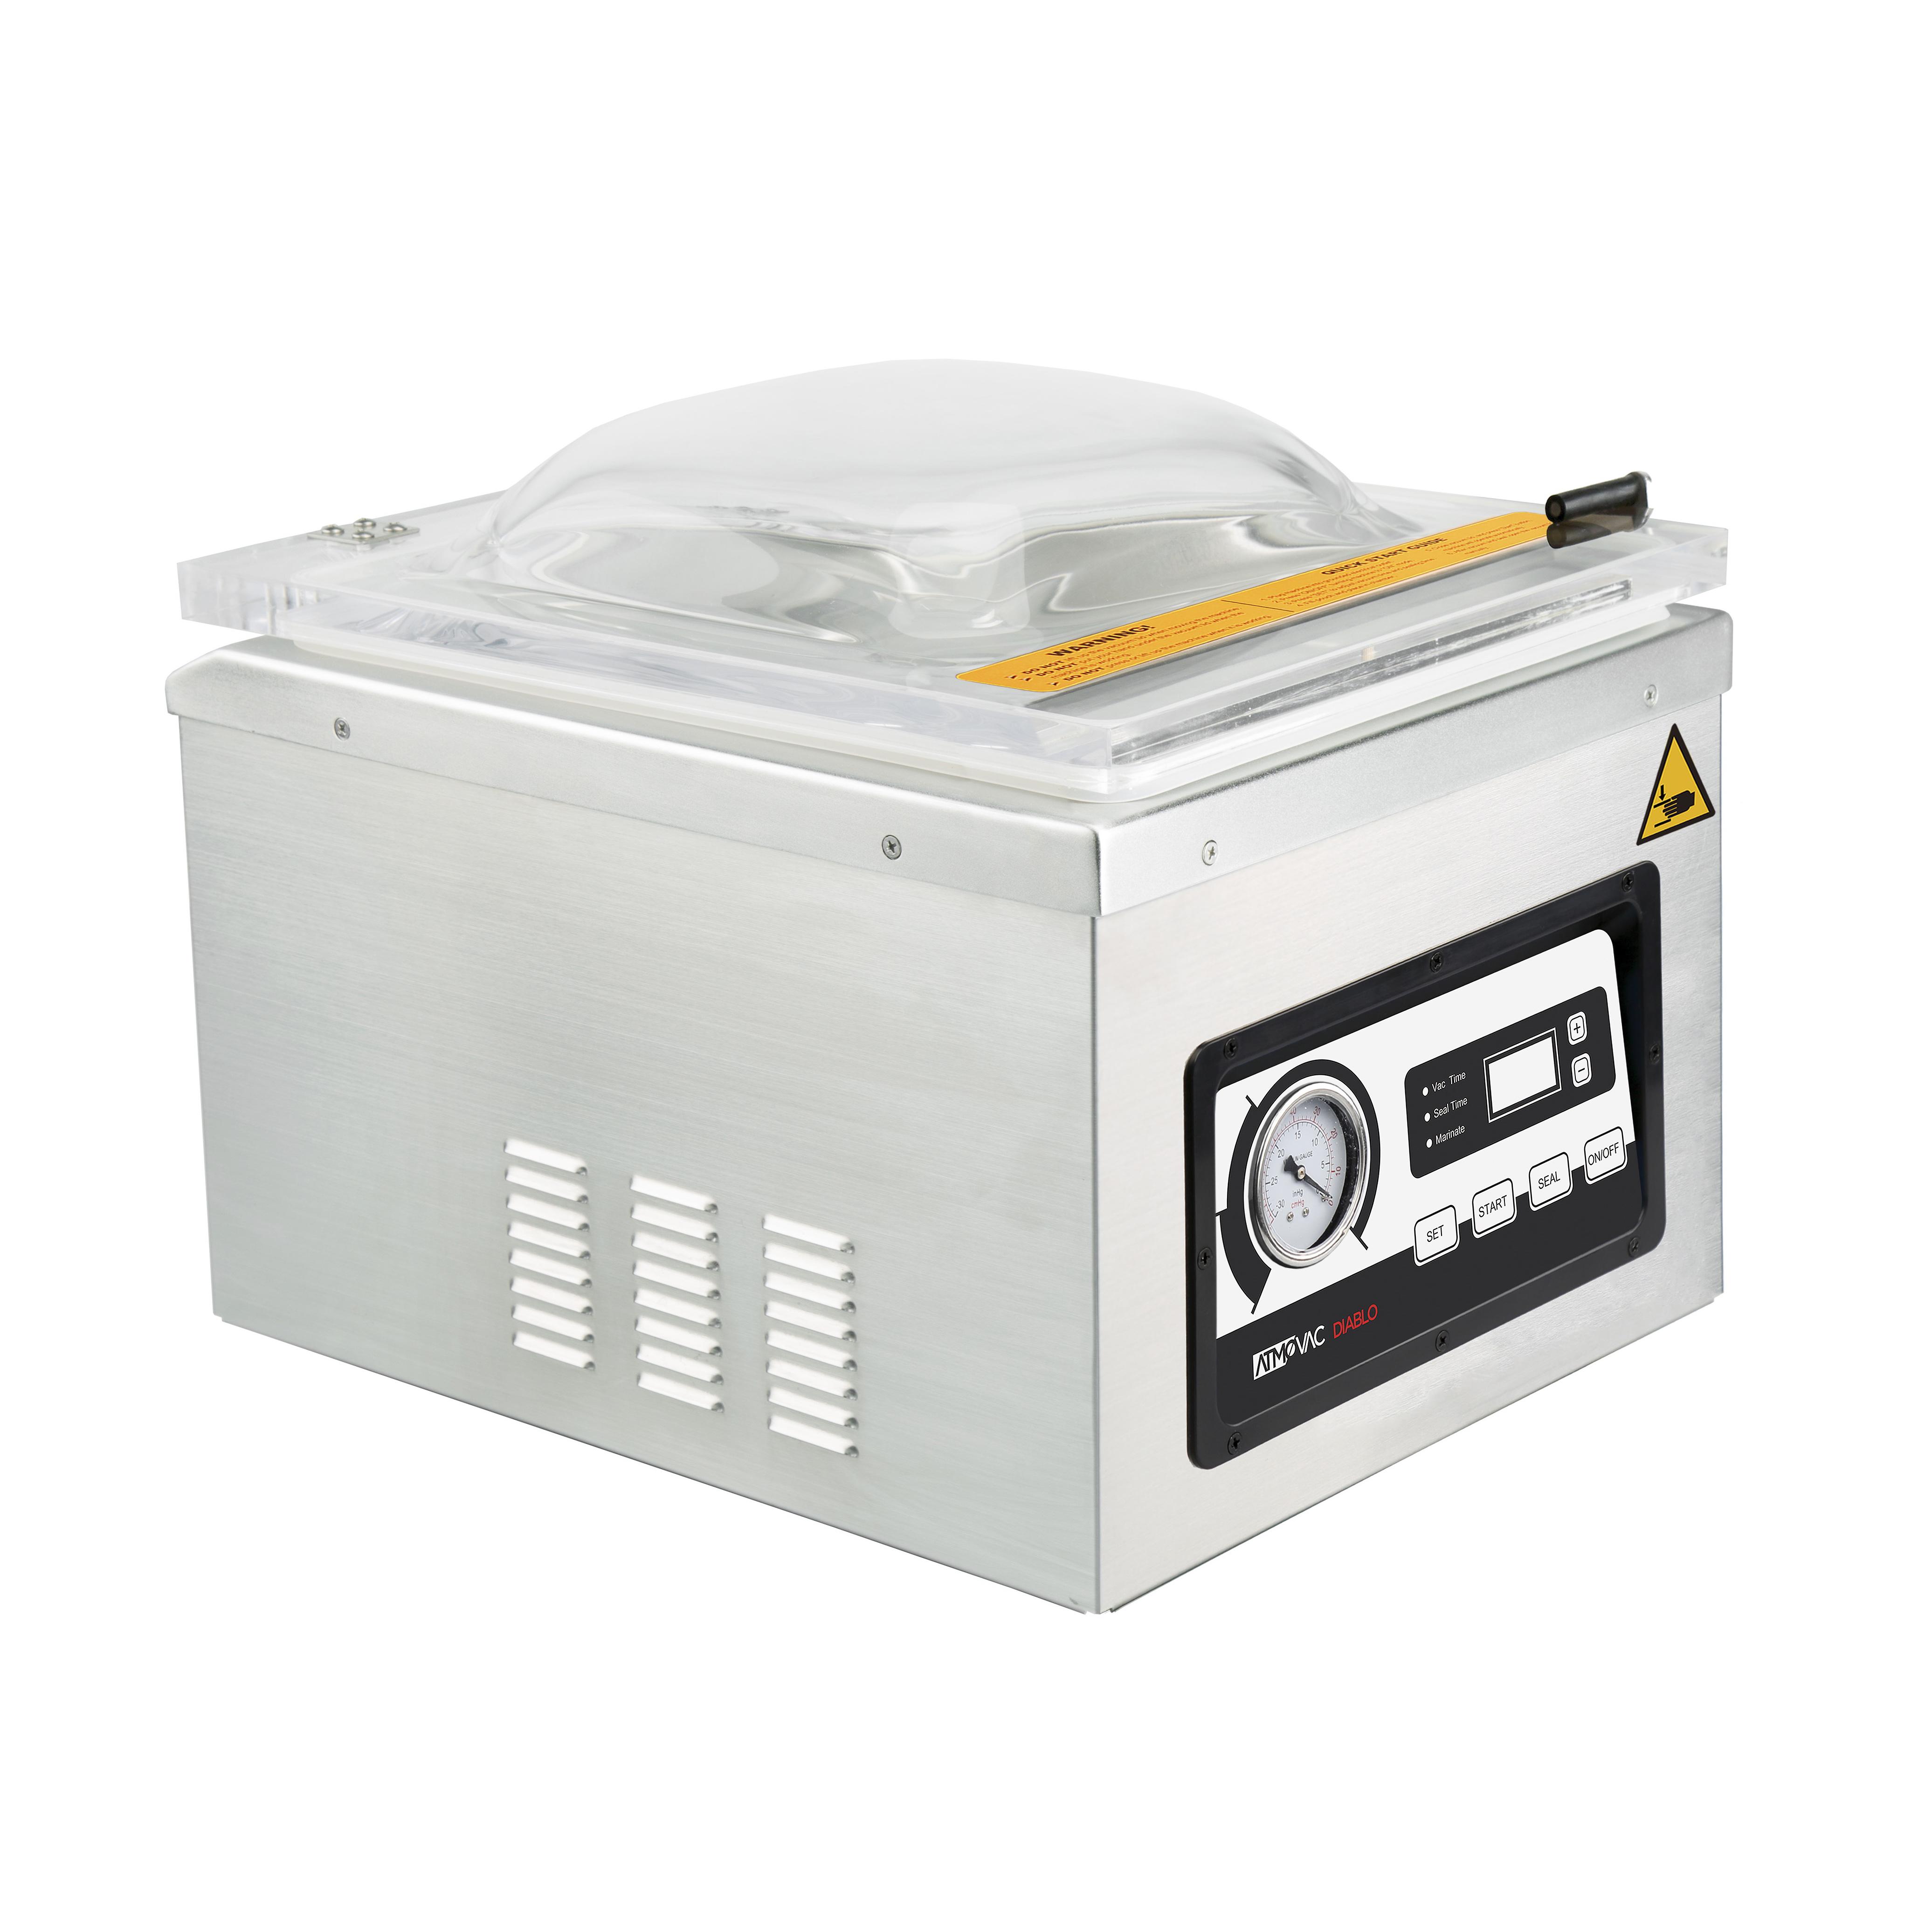 Eurodib USA DIABLO 10 food packaging machine